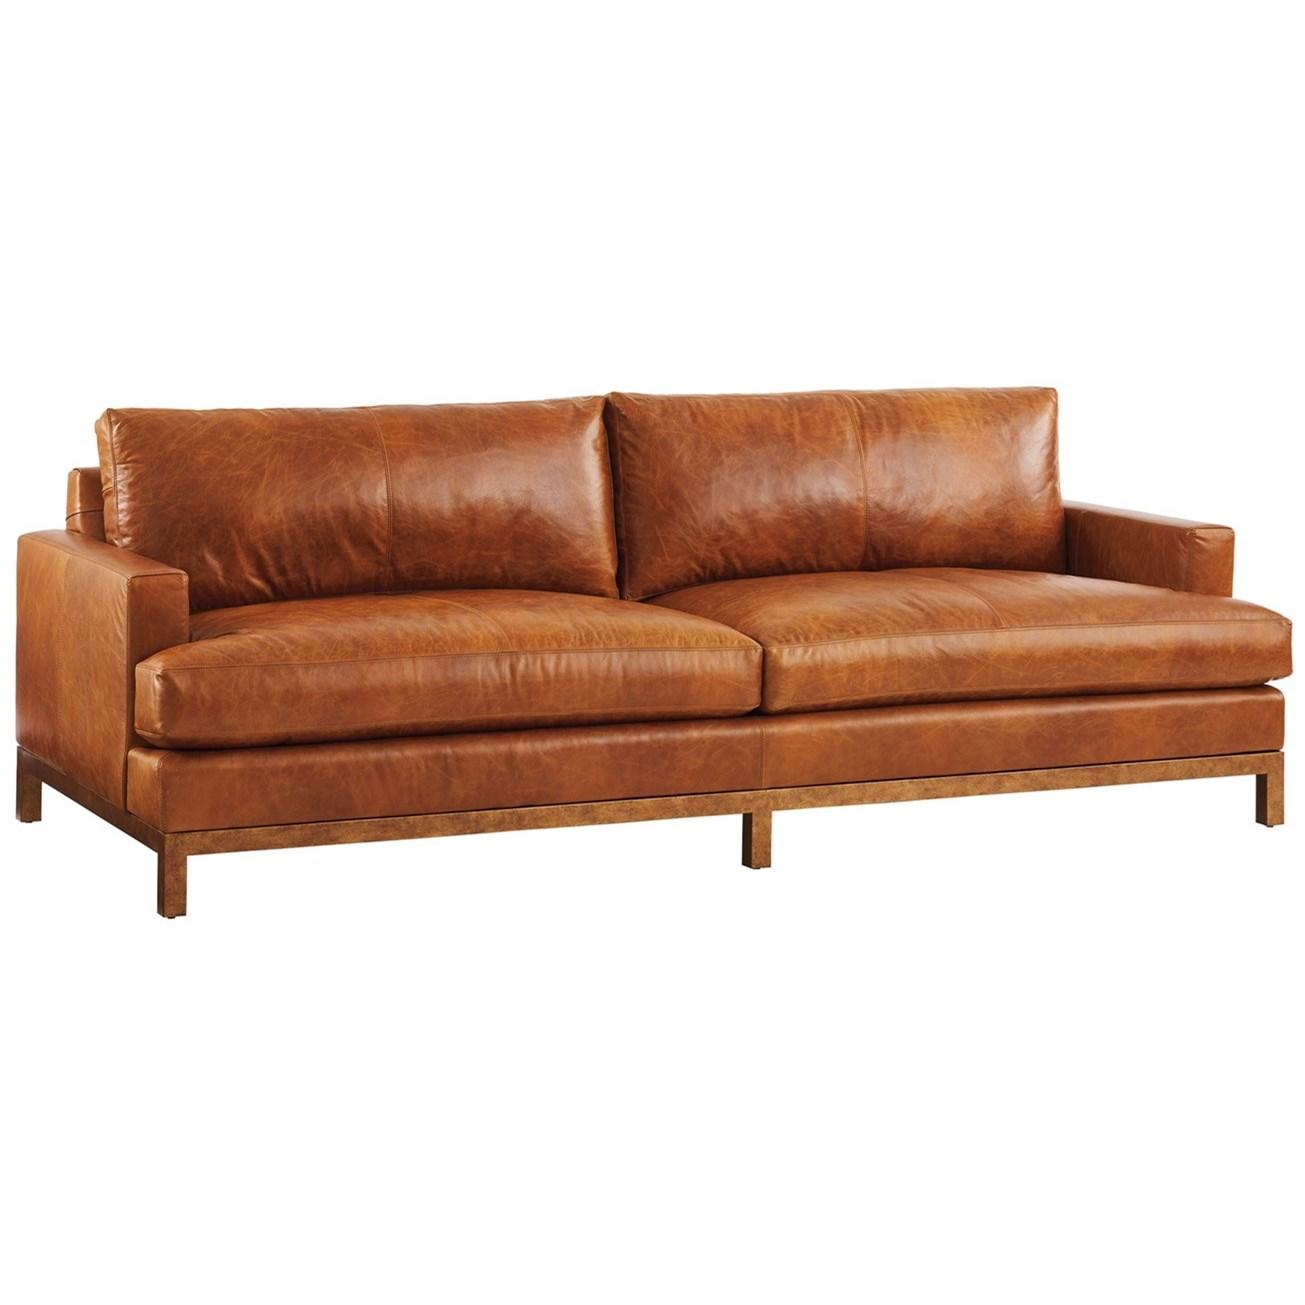 Barclay Butera Upholstery Horizon Sofa w/ Tan Leather & Brass Base  by Barclay Butera at Baer's Furniture